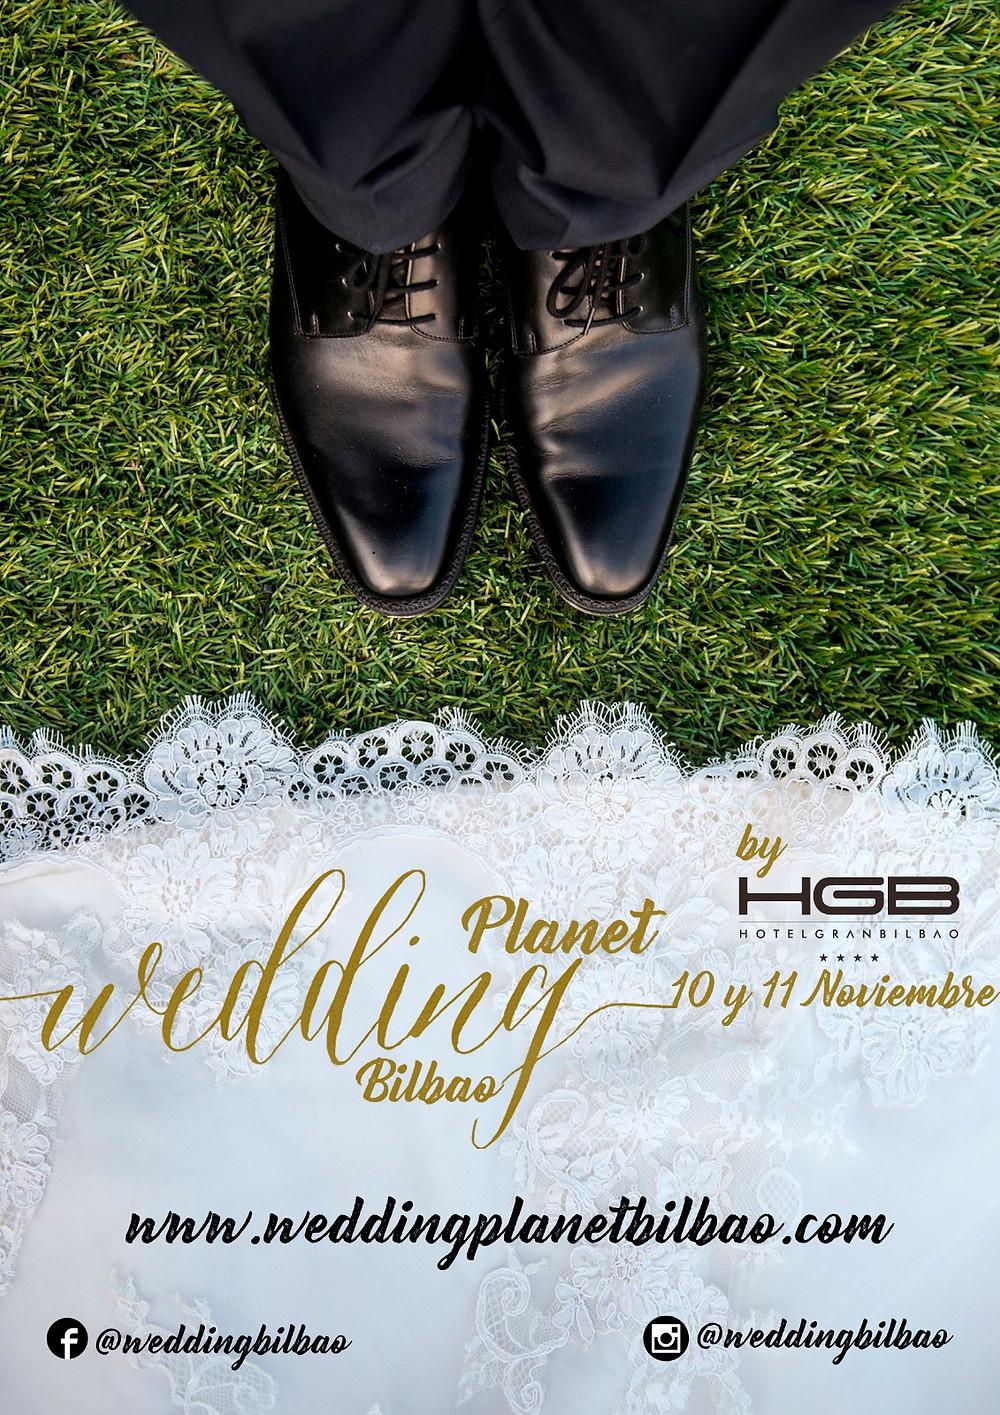 https://www.weddingplanetbilbao.com/